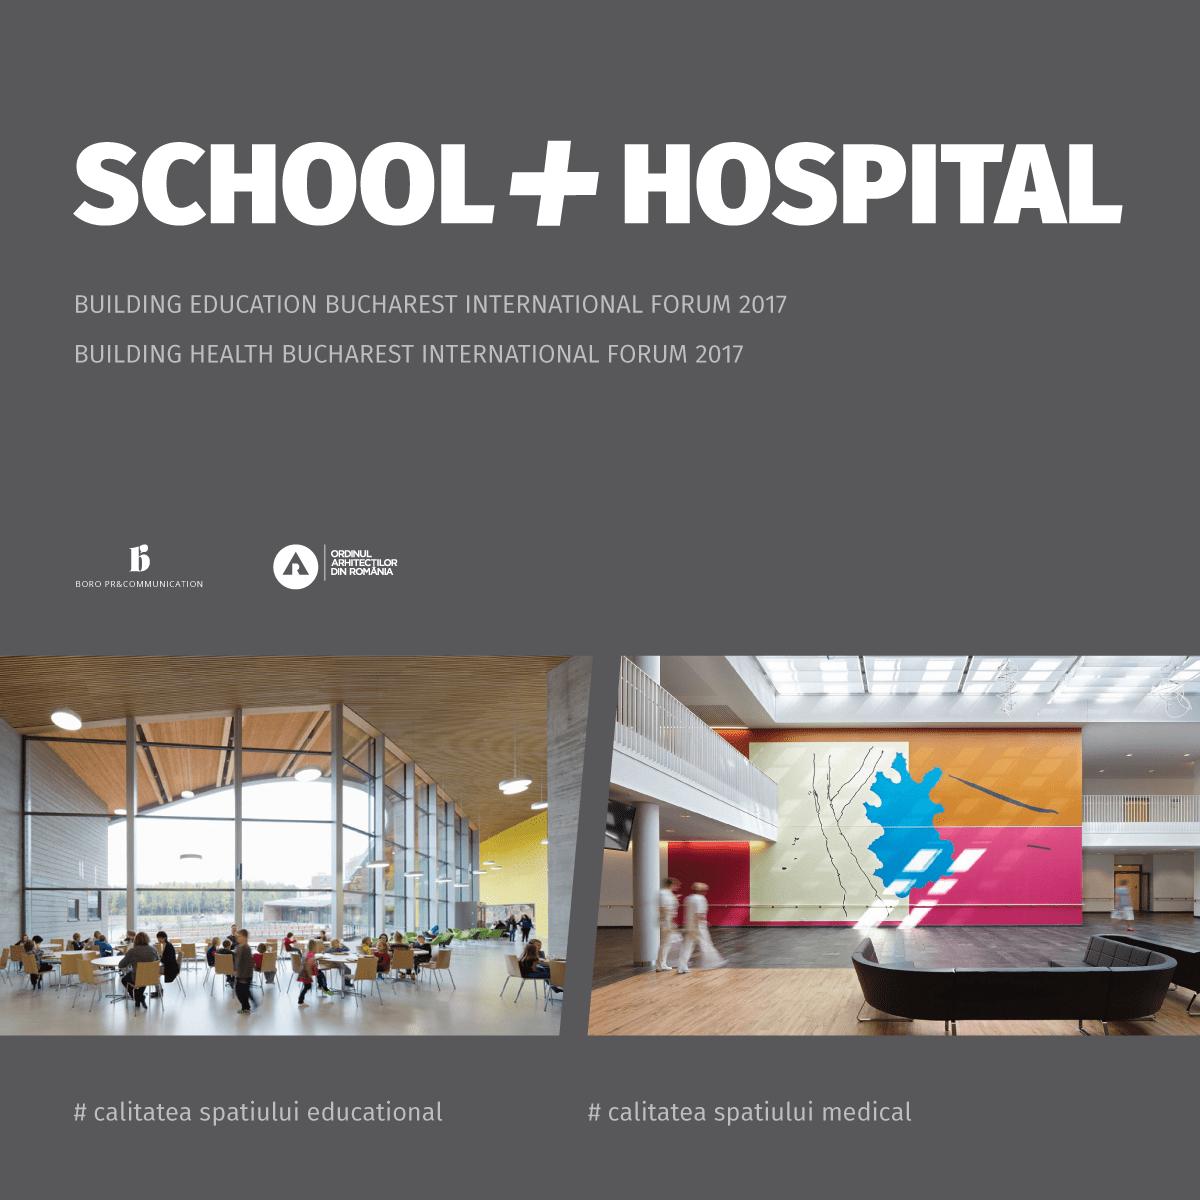 school and hospital